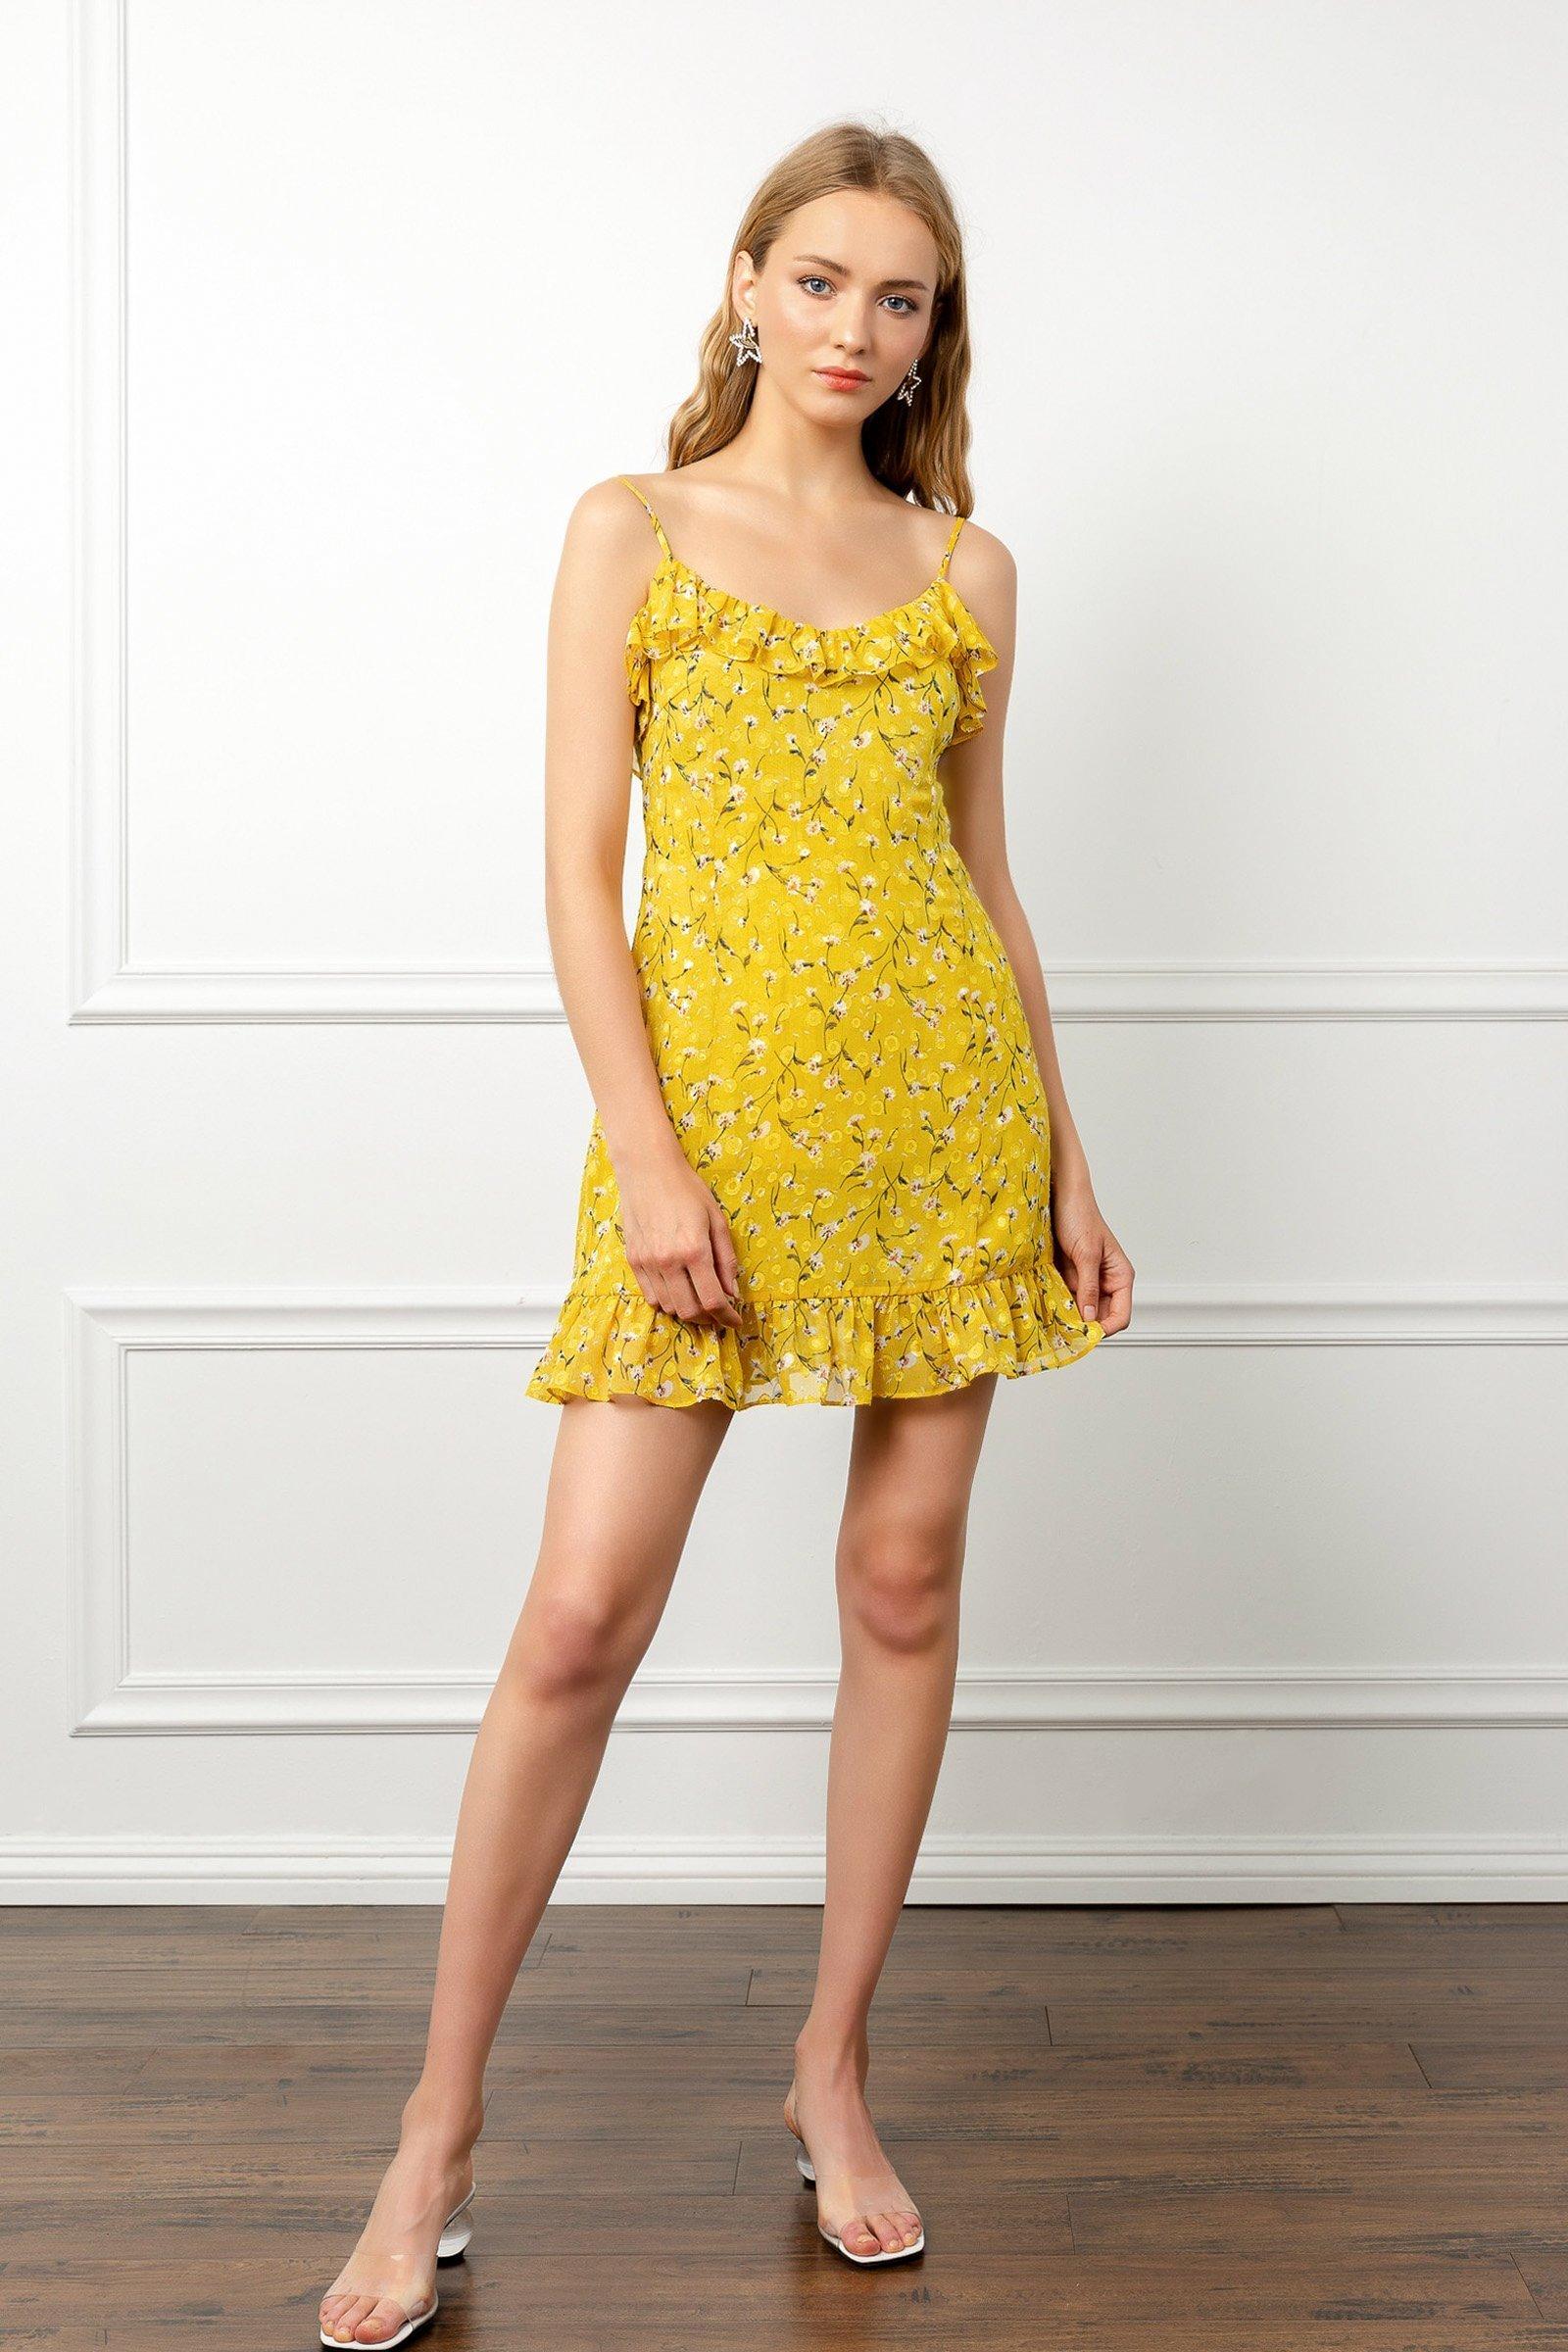 Image of Yellow Summer Dress